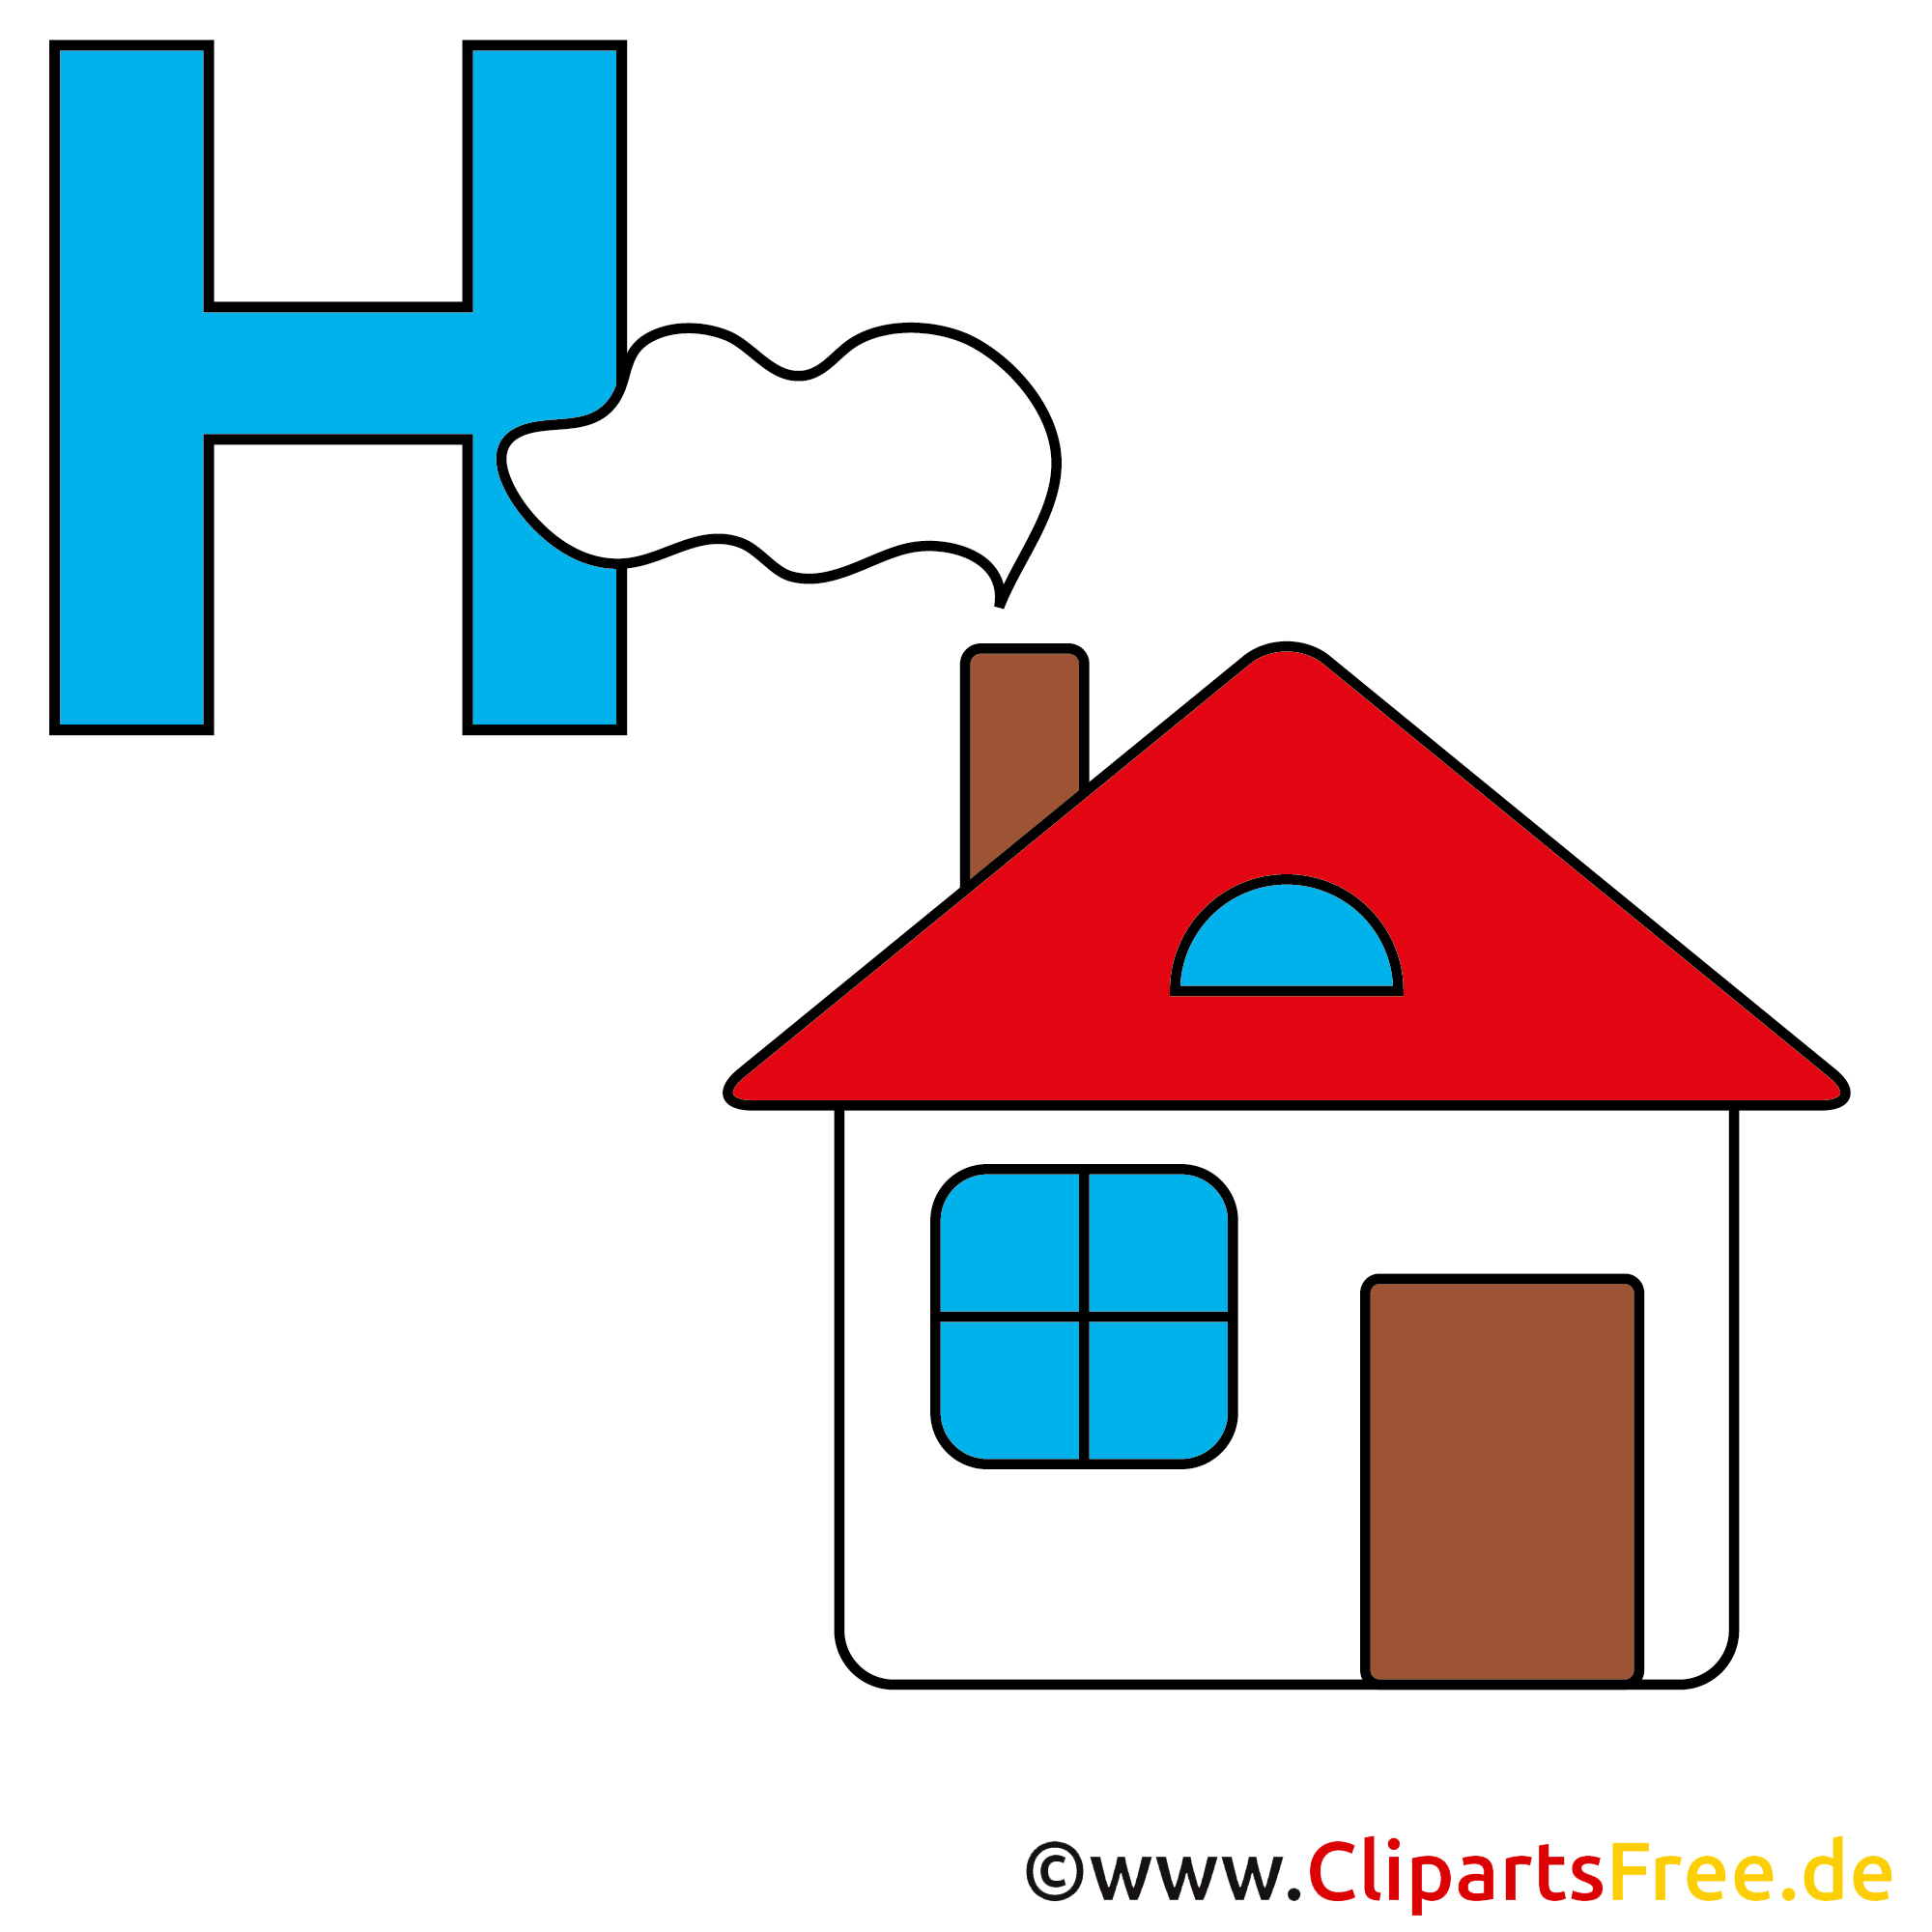 Bildwörterbuch - Haus Bild